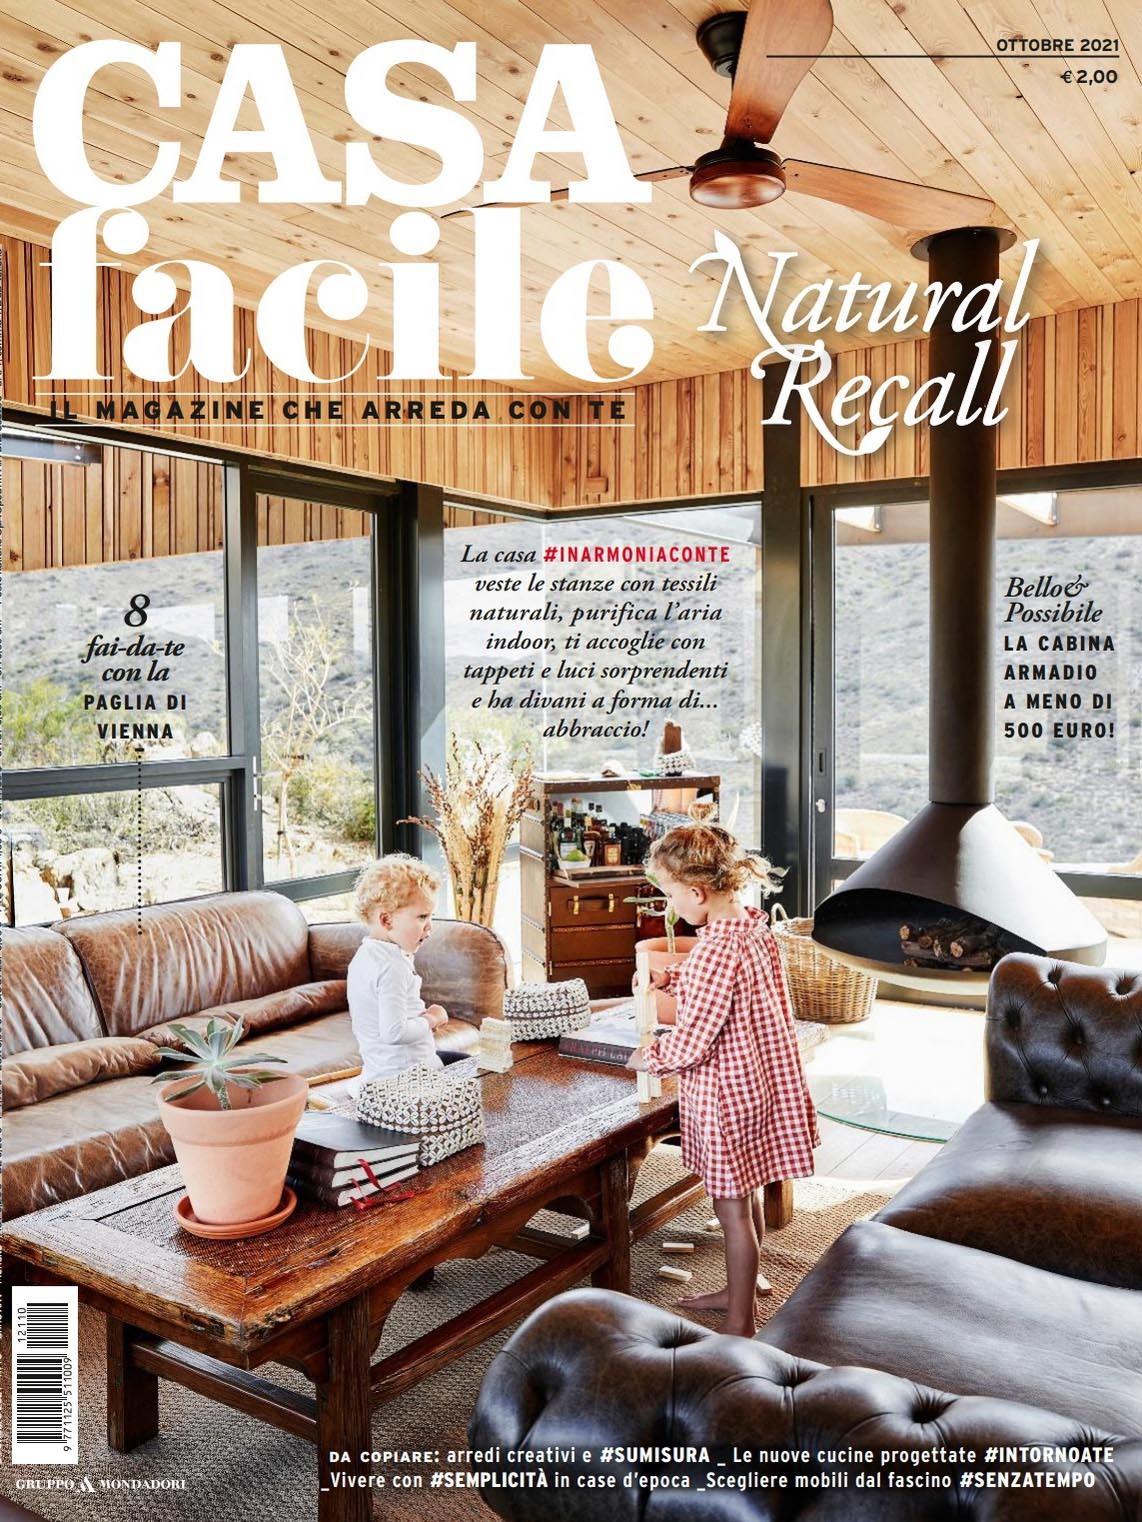 《Casa Facile》意大利家居空间装饰艺术杂志2021年10月号